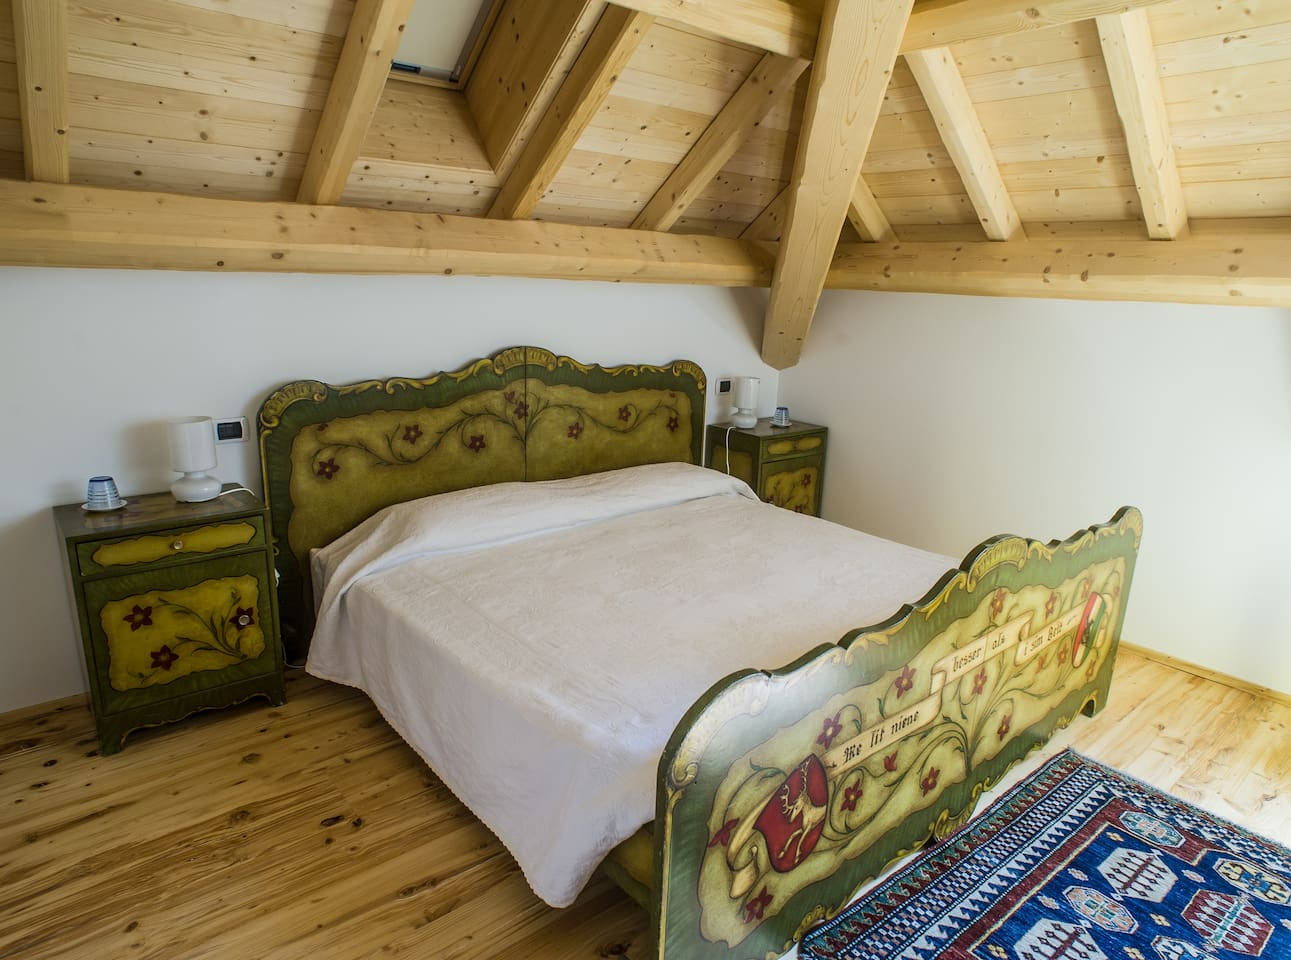 Il letto bavarese, dipinto a mano